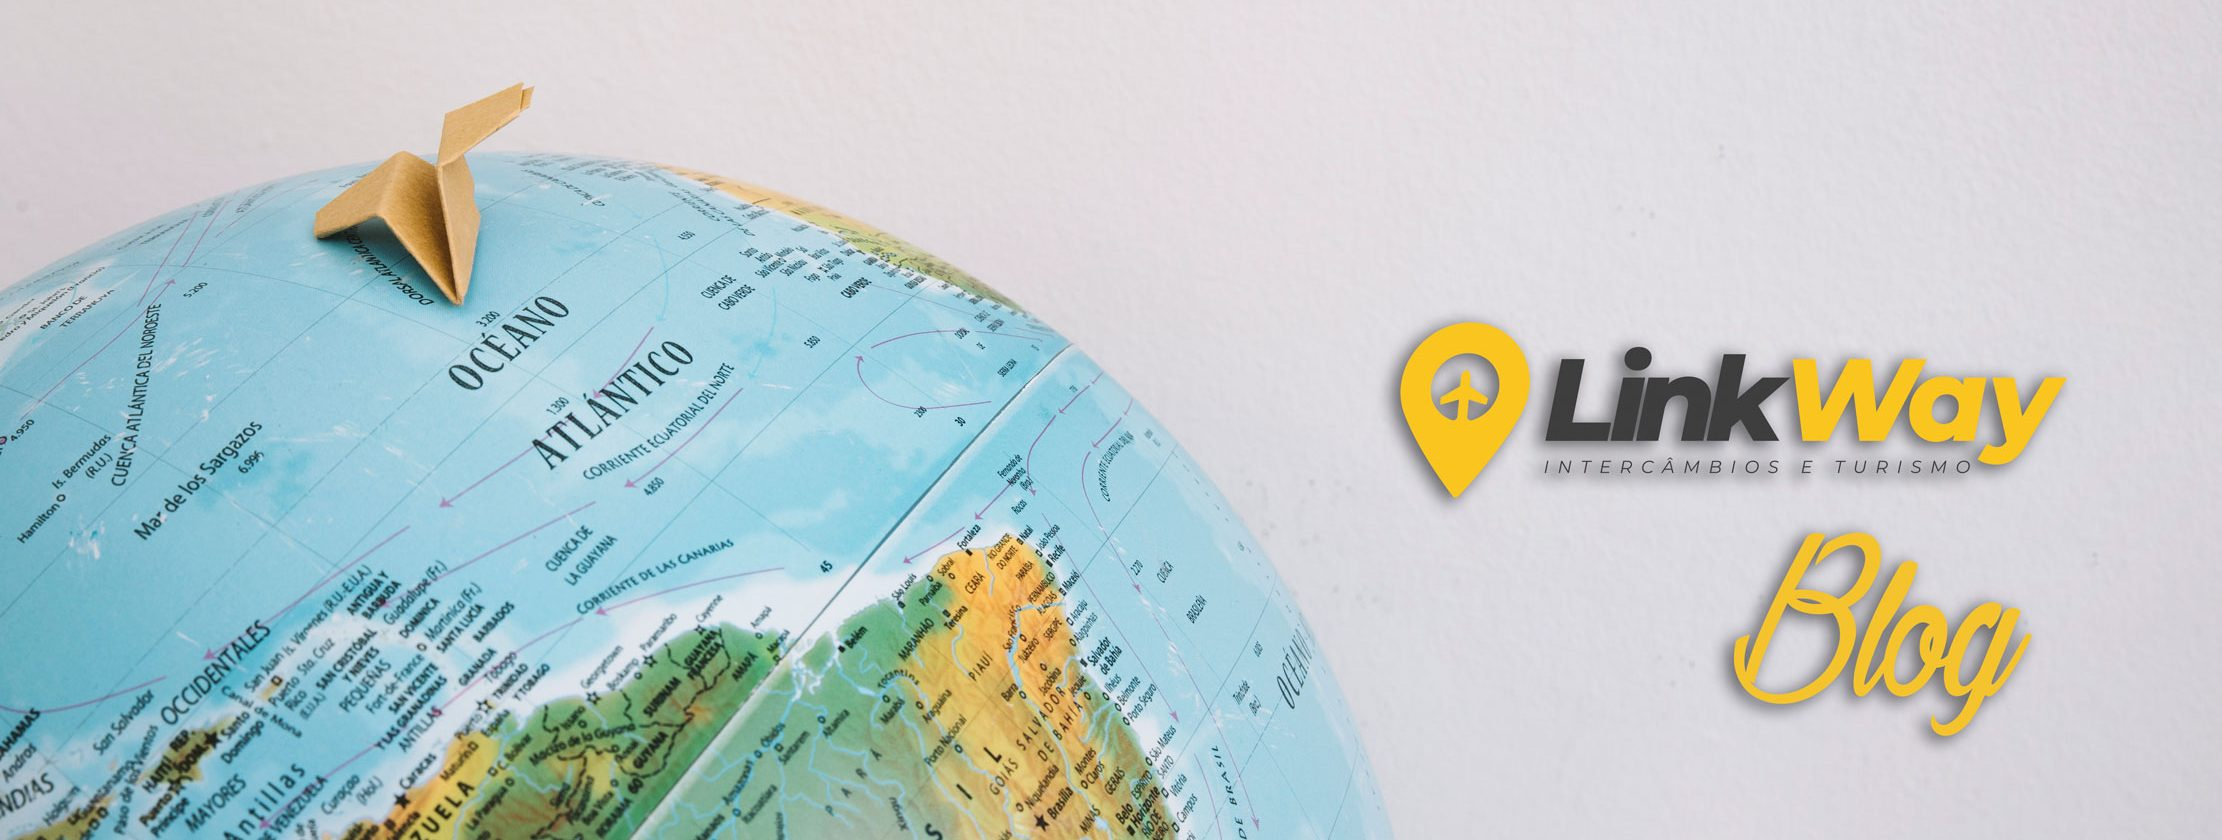 Linkway Intercâmbios e Turismo – Blog